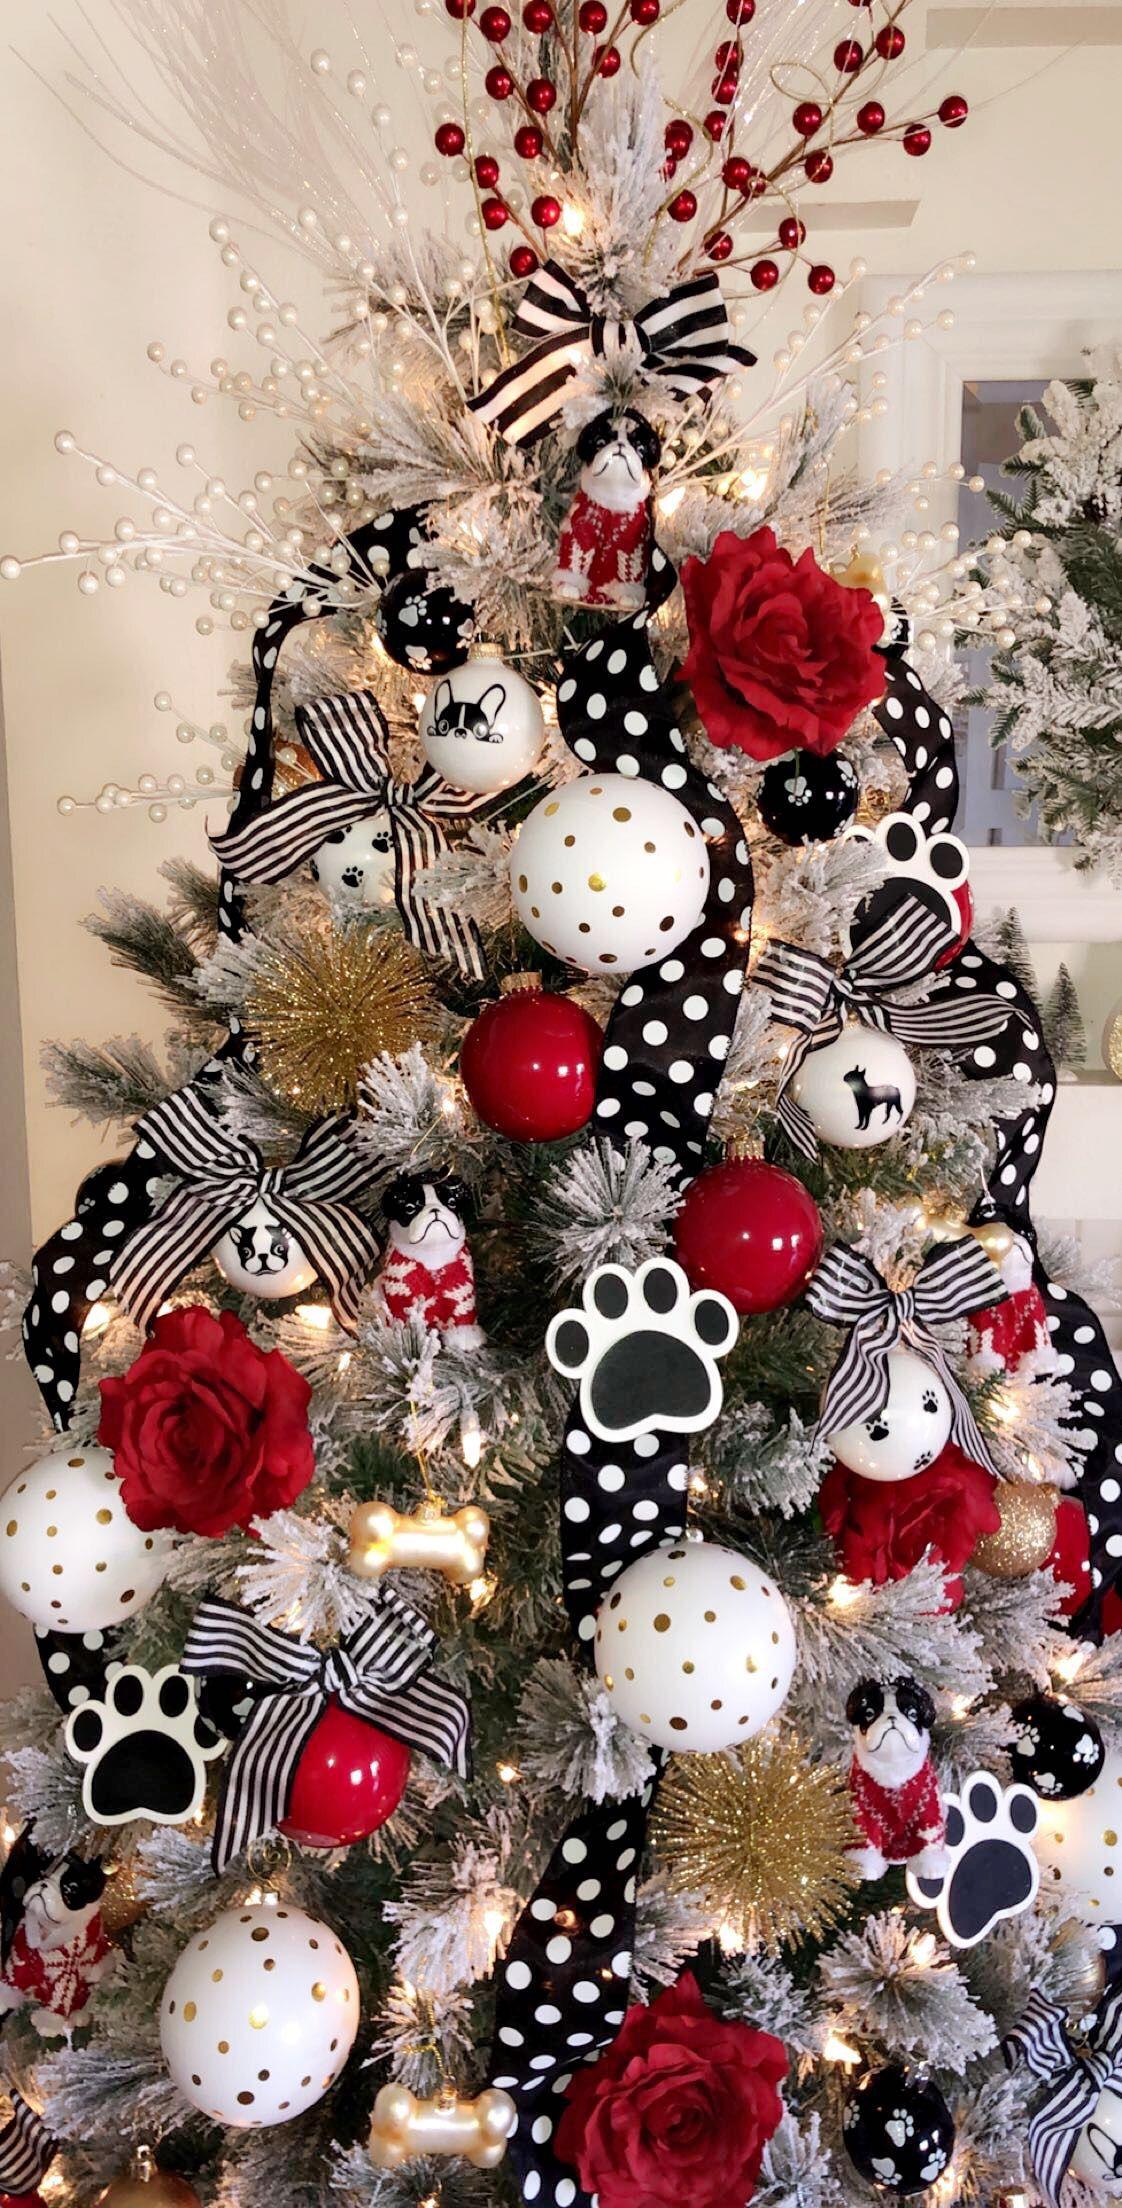 Boston Terrier Ornaments Christmas Tree Inspiration Christmas Tree Themes Christmas Tree Design